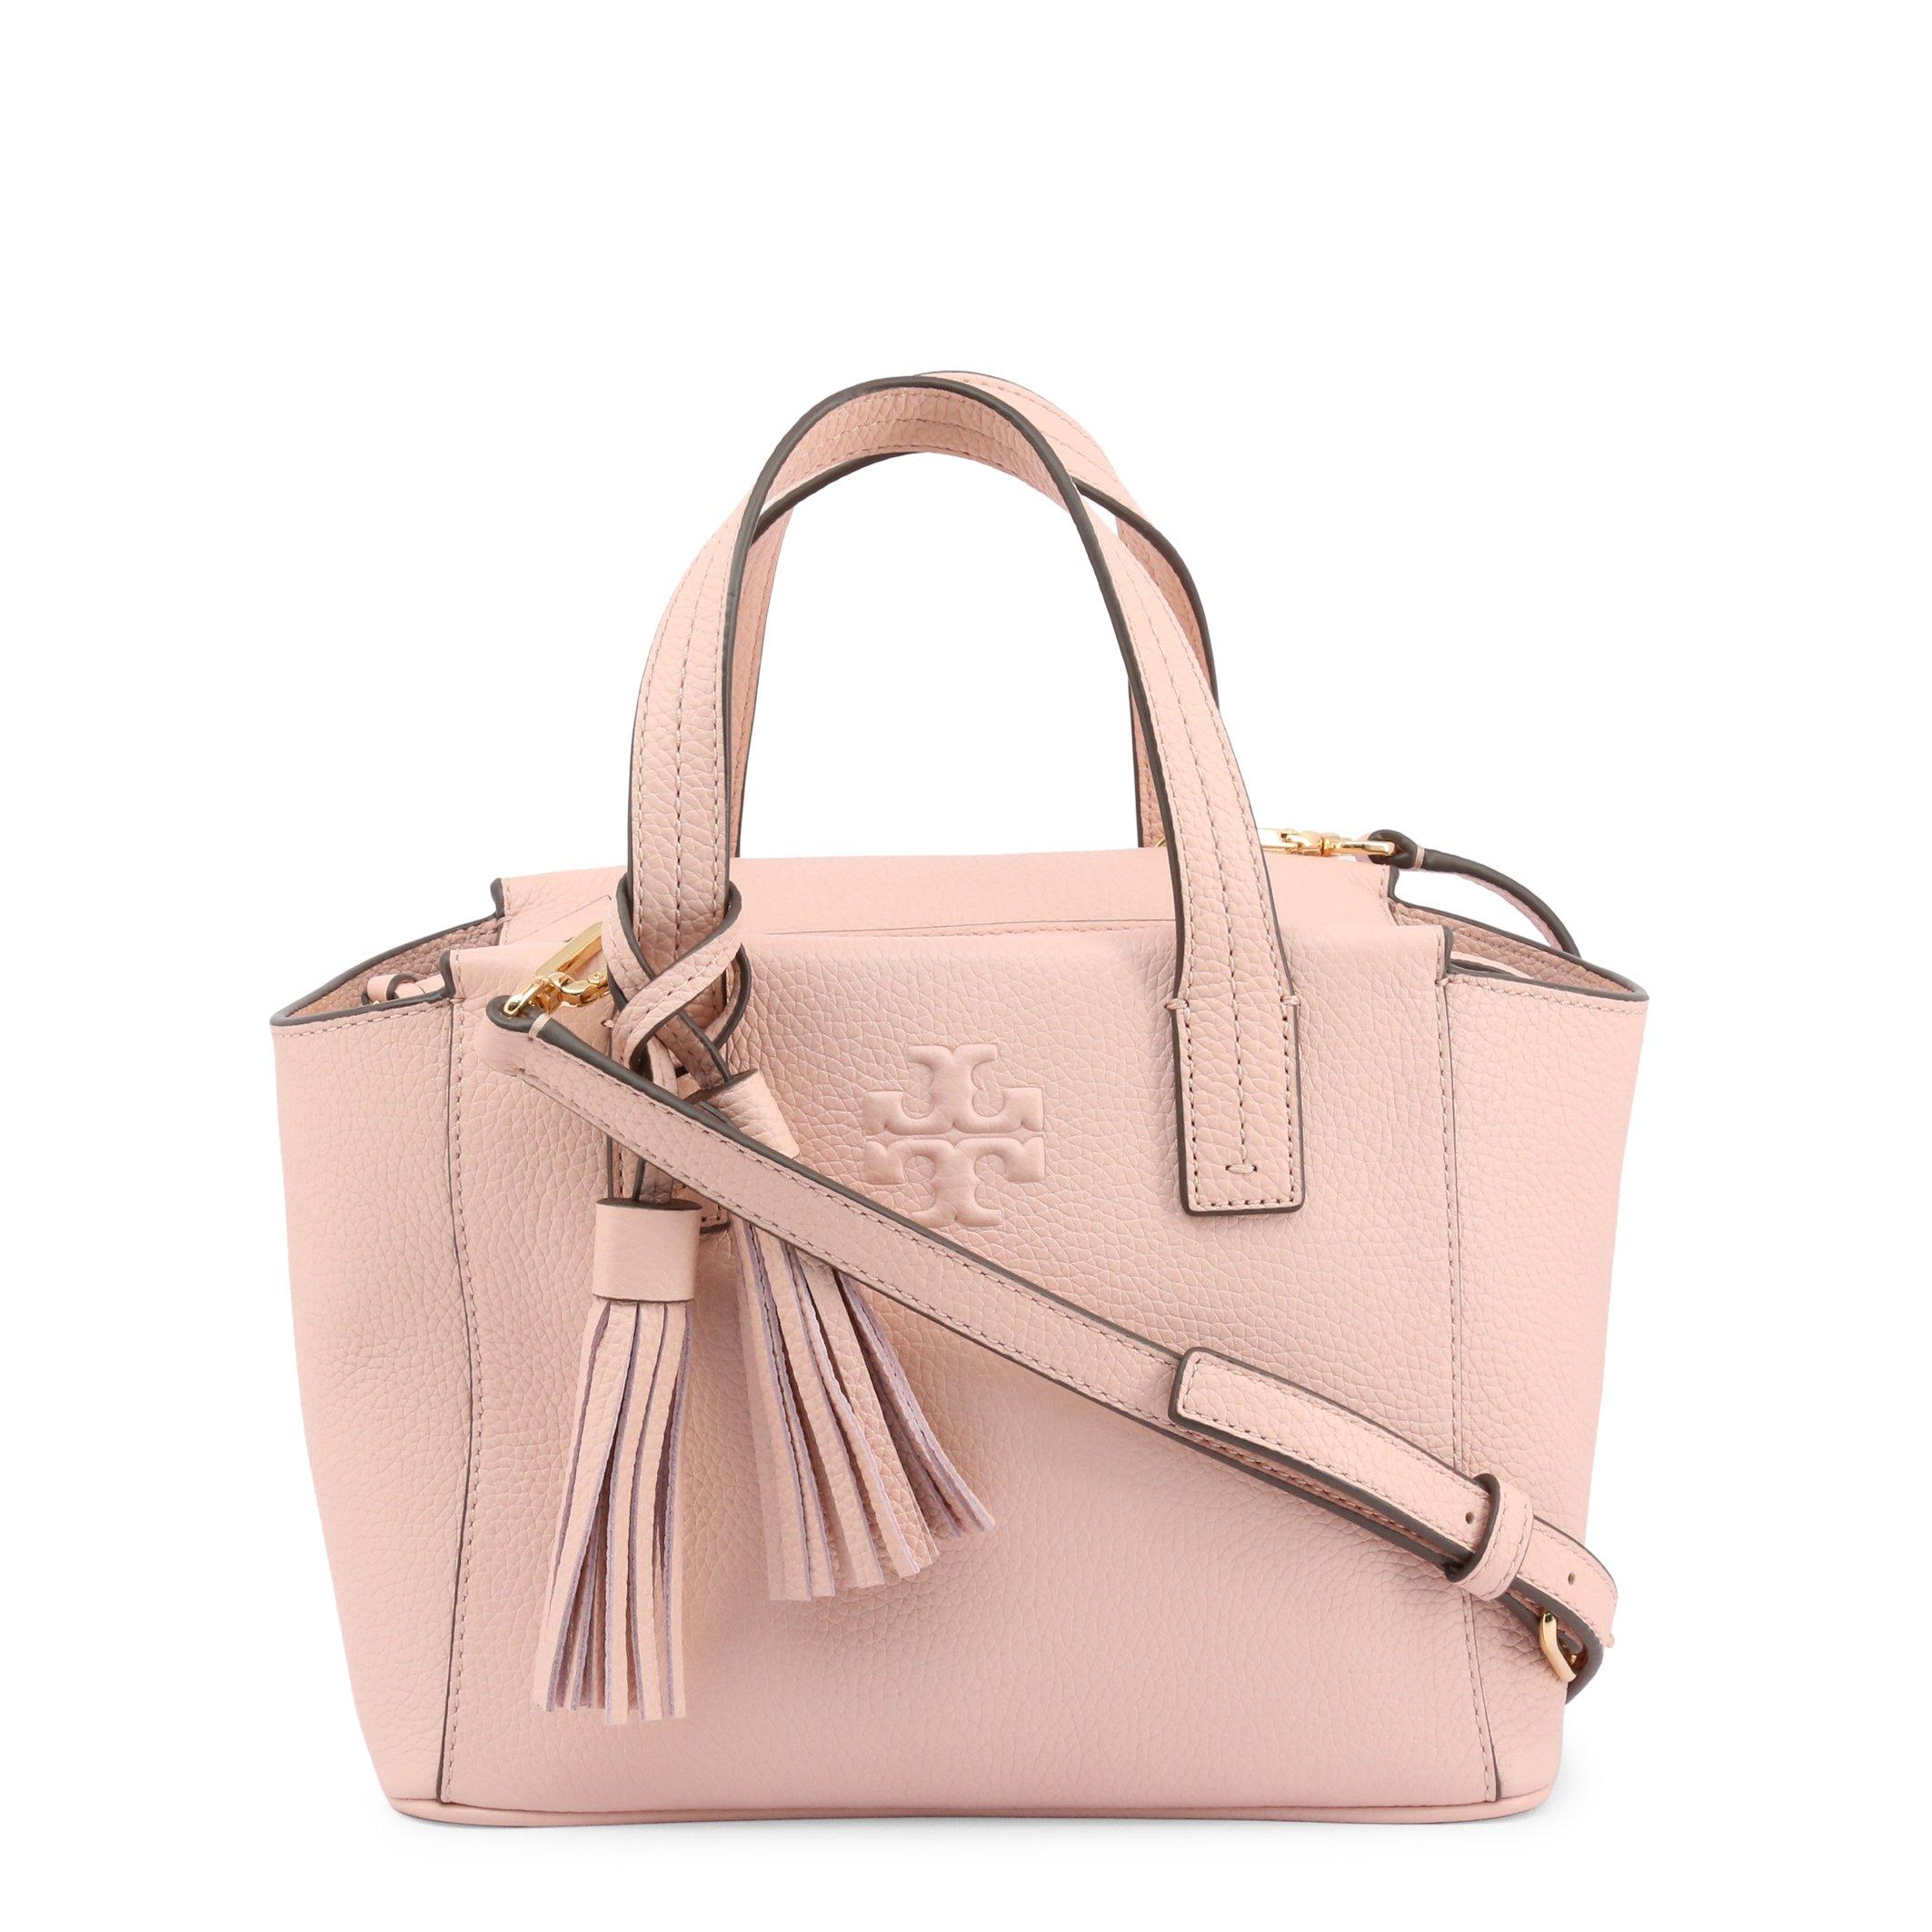 Tory Burch Women's Handbag Various Colours 77165 - pink NOSIZE